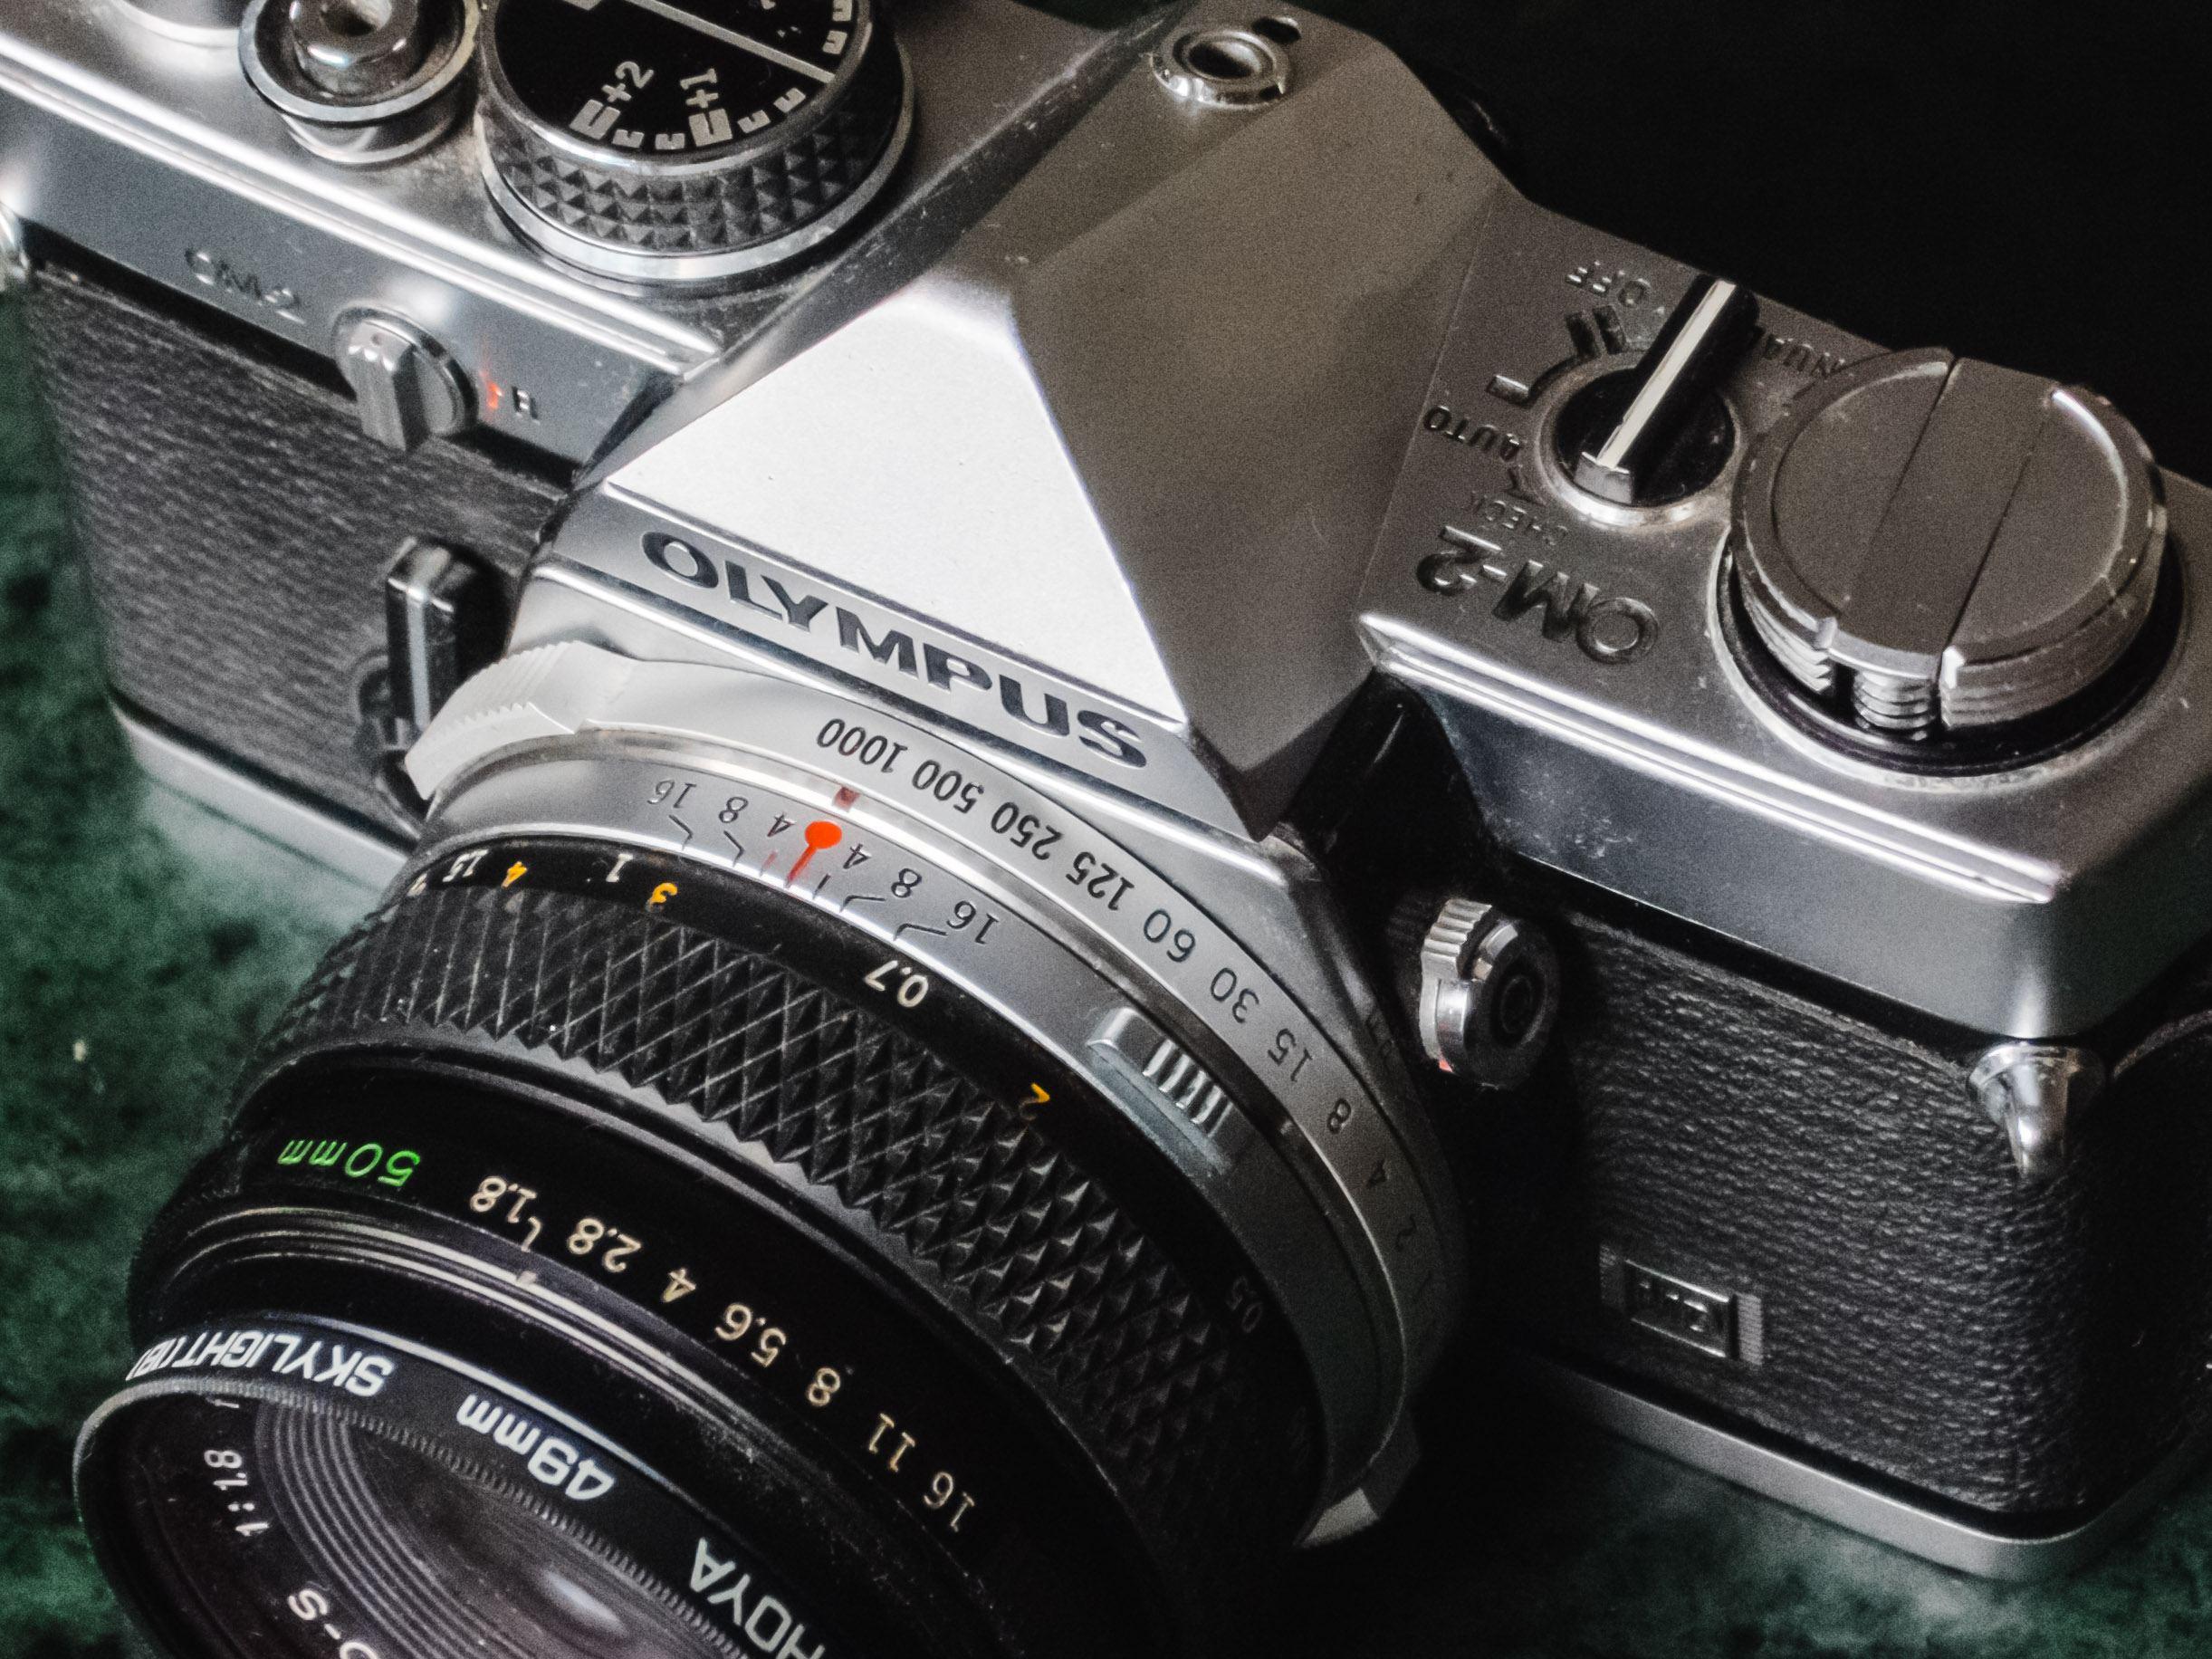 image_08_vintagecamera